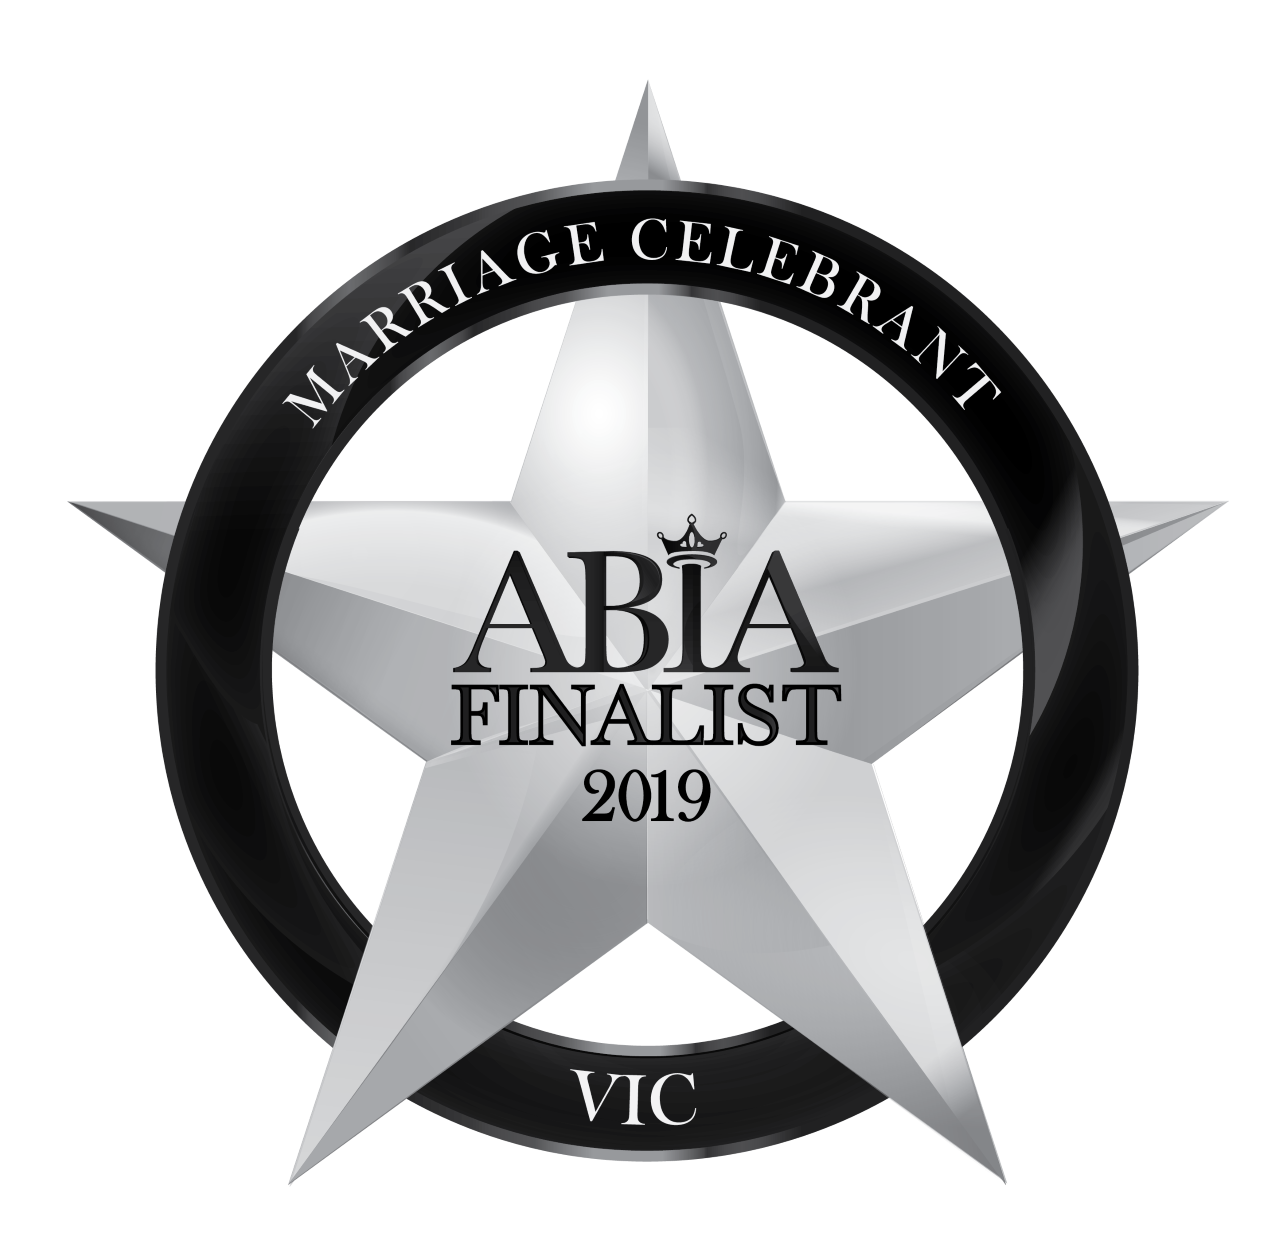 ABIA Finalist 2019